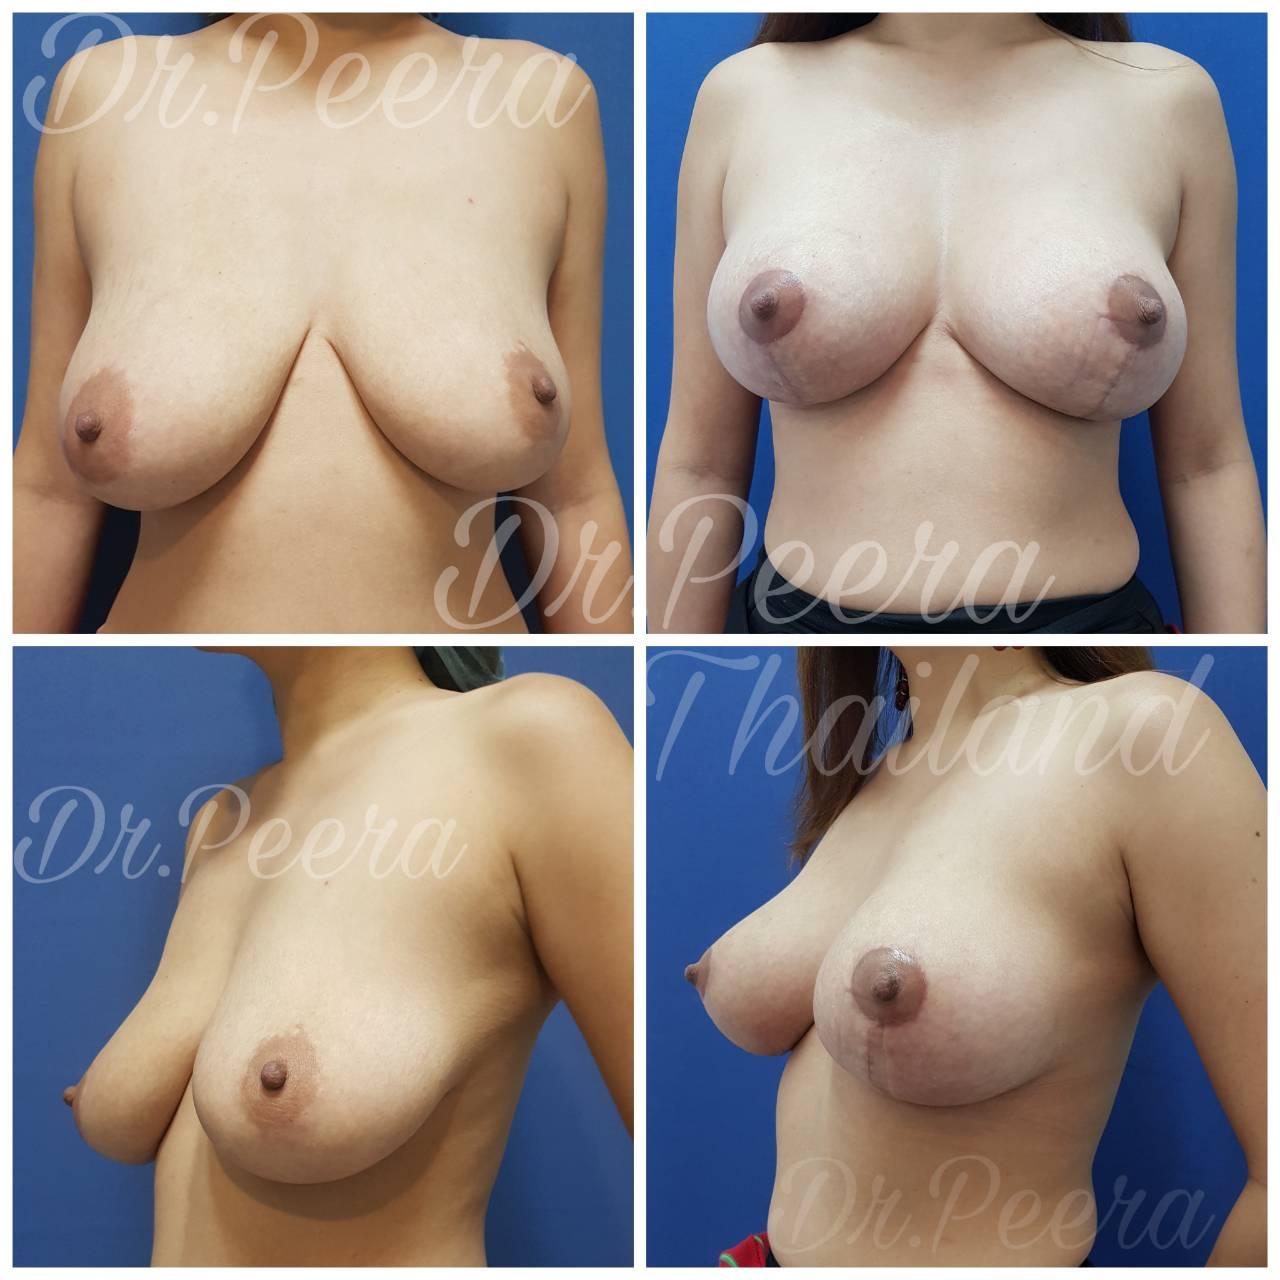 659911 - Breast Lifting ( ผ่าตัดยกกระชับเต้านม )